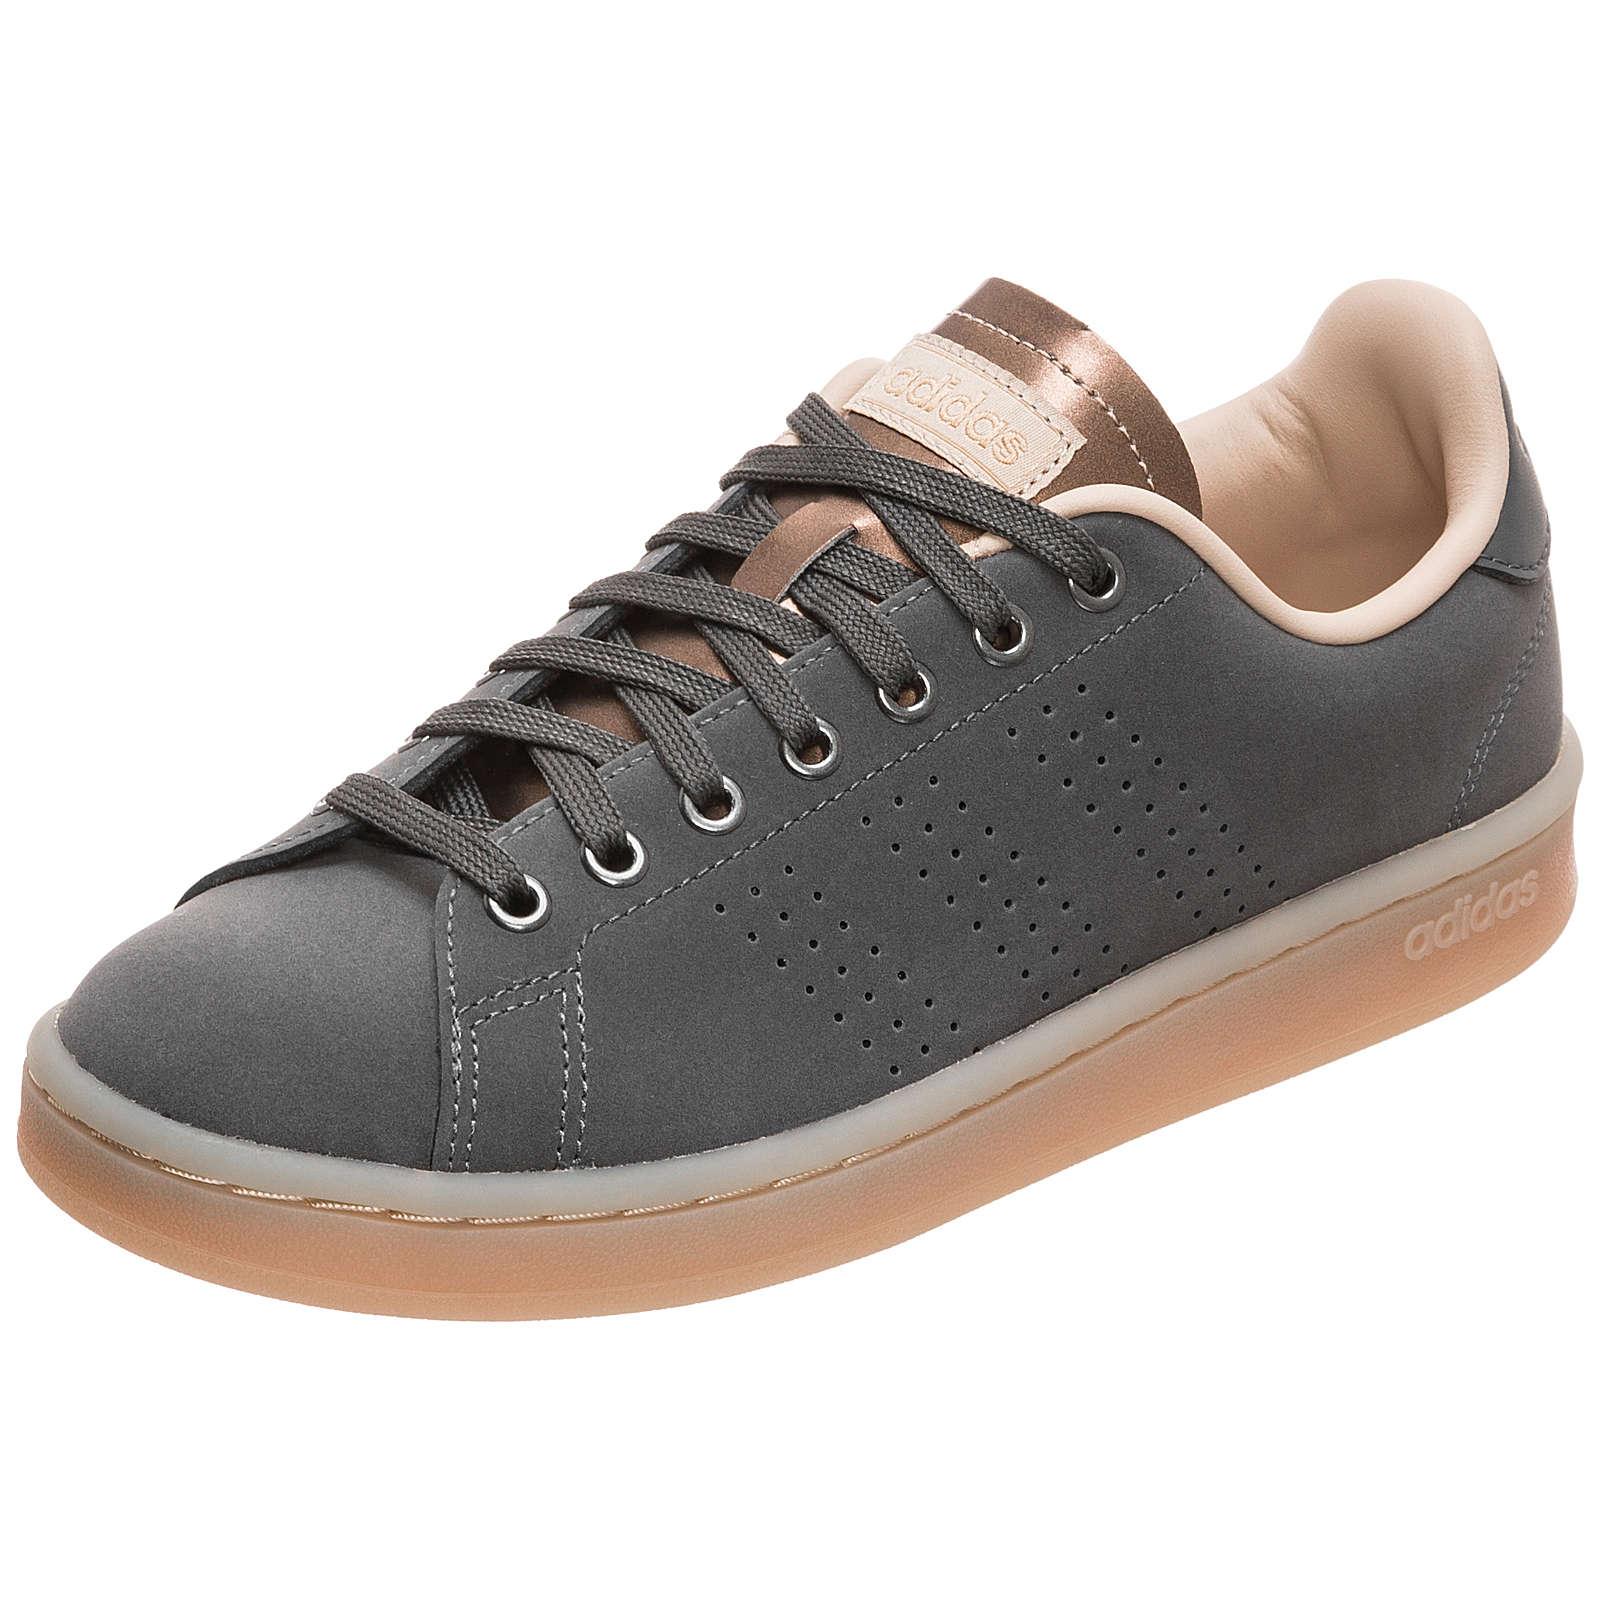 adidas Sport Inspired Advantage Sneaker Damen grau/braun Damen Gr. 41 1/3